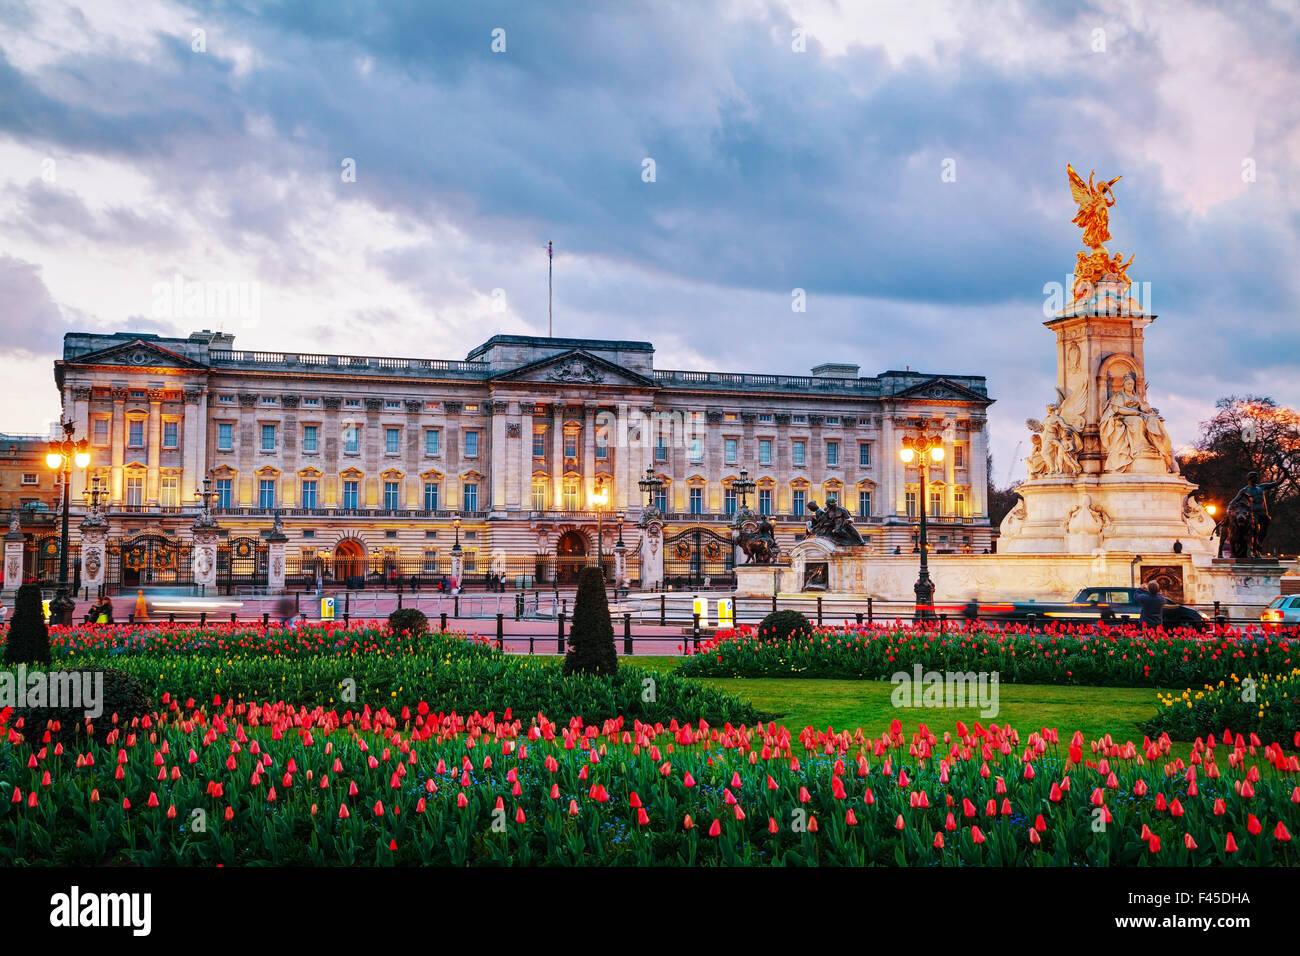 Buckingham palace in London, Great Britain Stock Photo